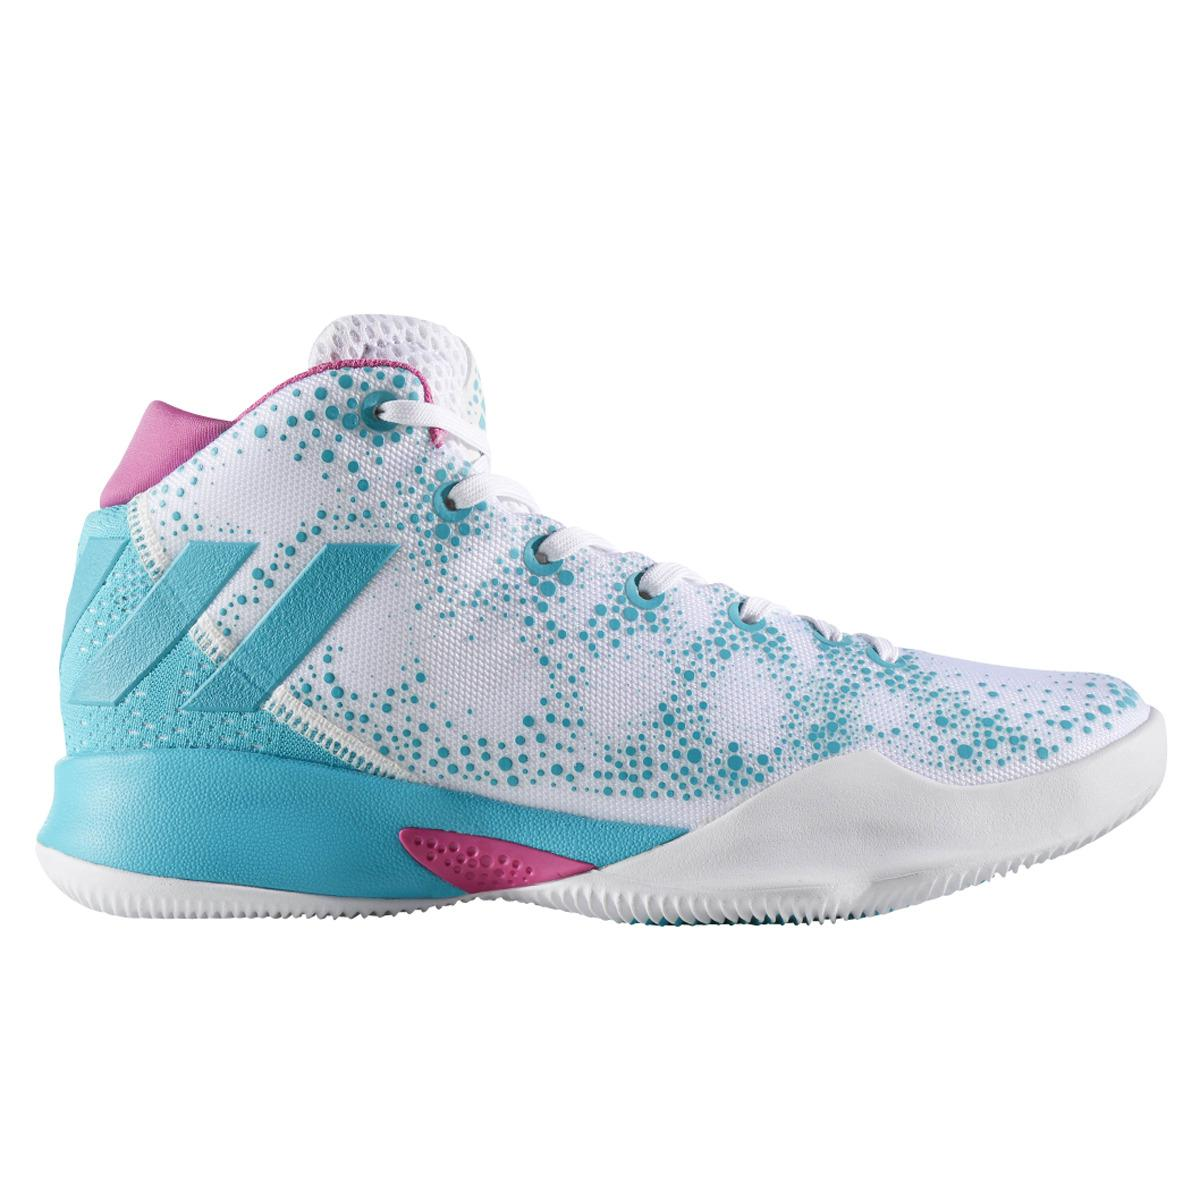 ad9cb48bd20 Lyst - adidas Crazy Heat Basketball Shoes in Blue